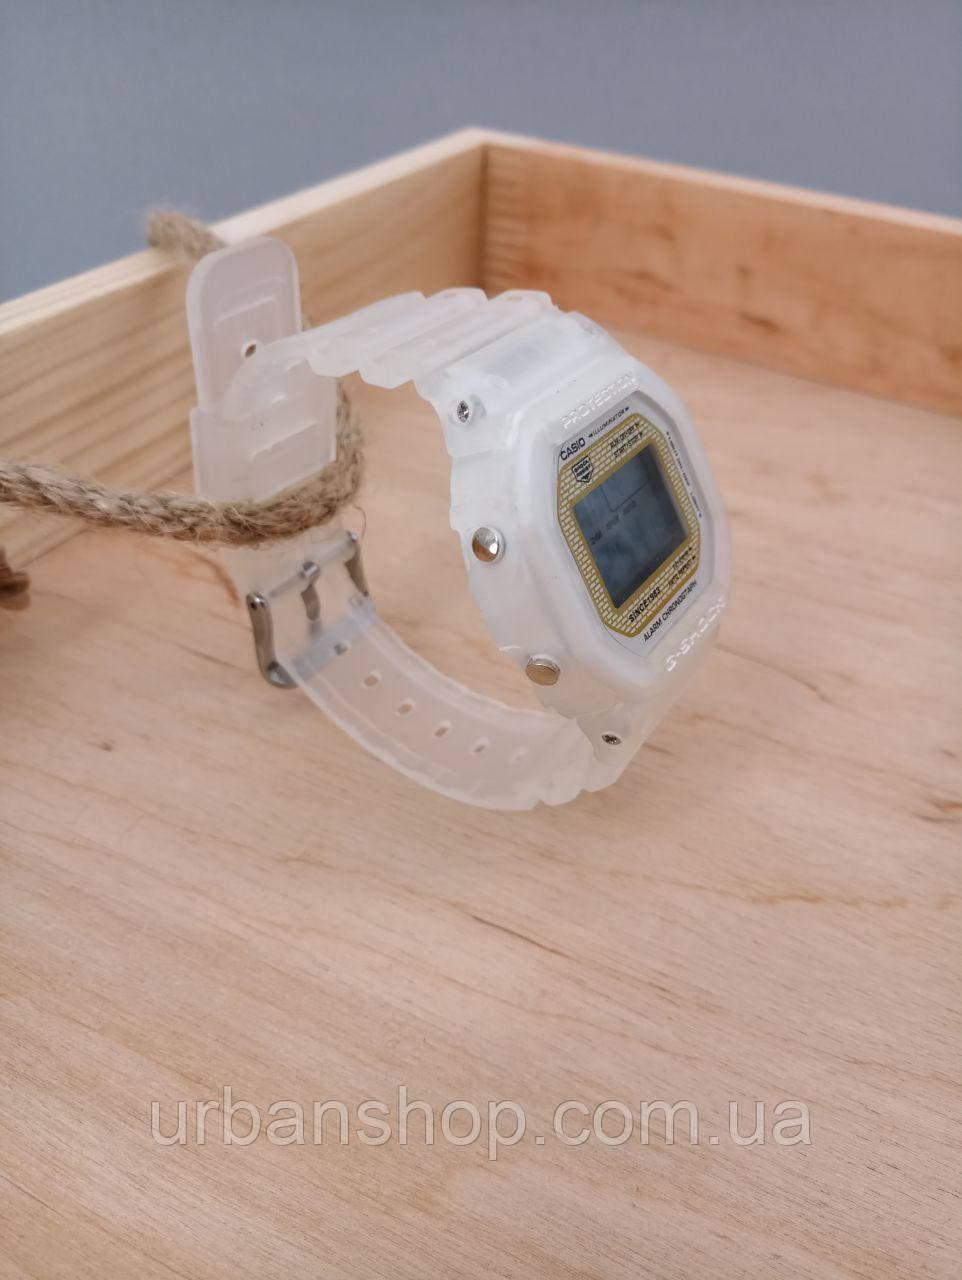 Годинник G - Shock white